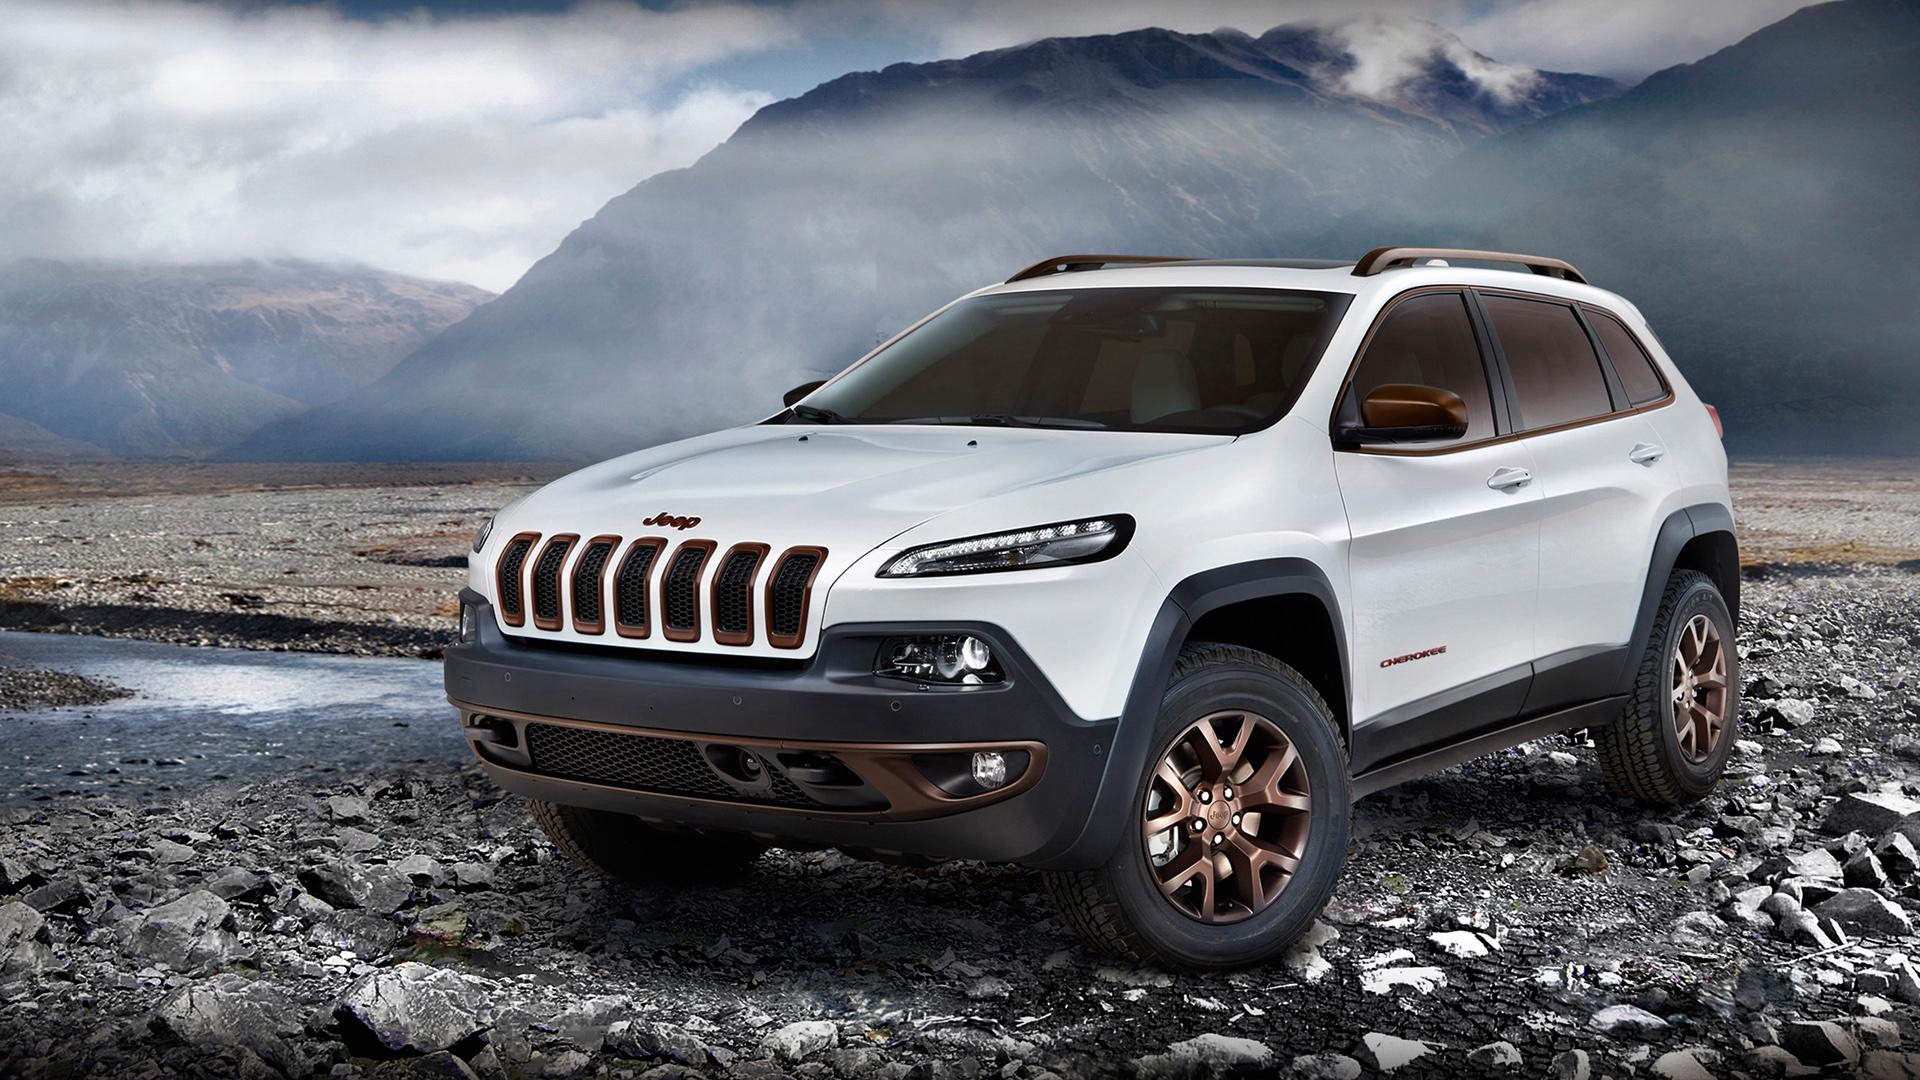 2014 Jeep Cherokee Sageland Concept Wallpaper Hd Car Wallpapers